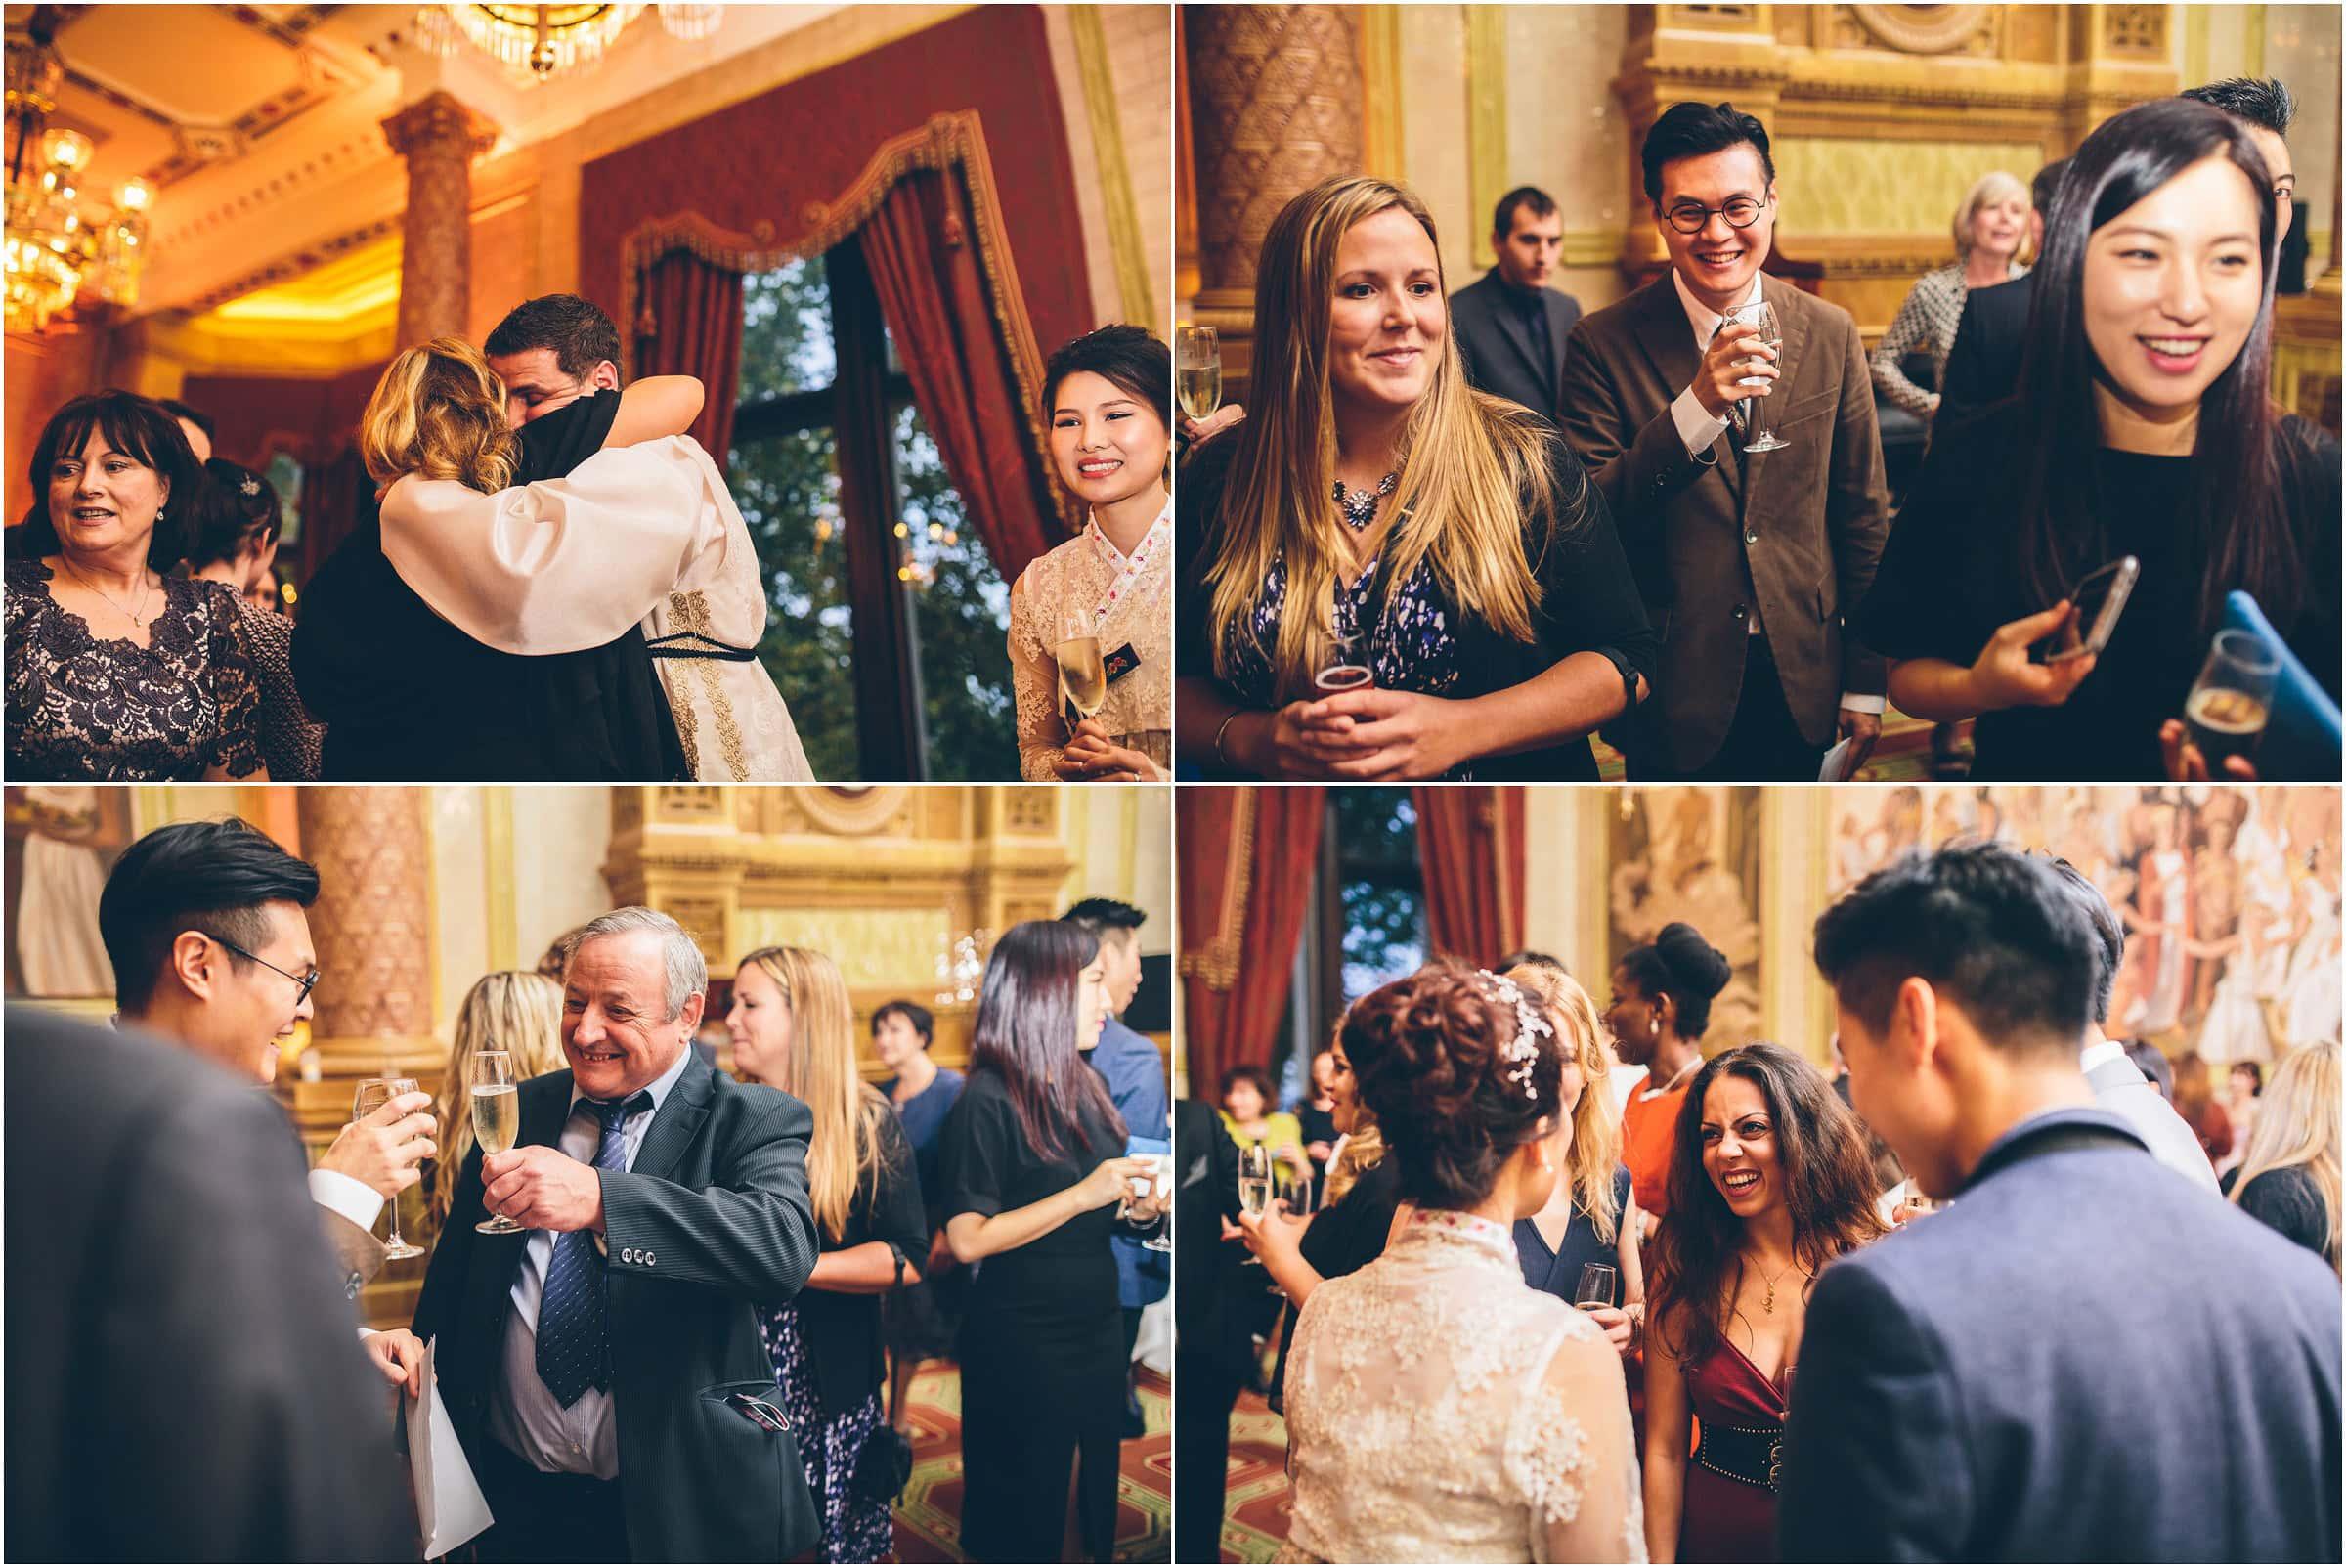 Royal_Horseguards_Wedding_Photography_0056